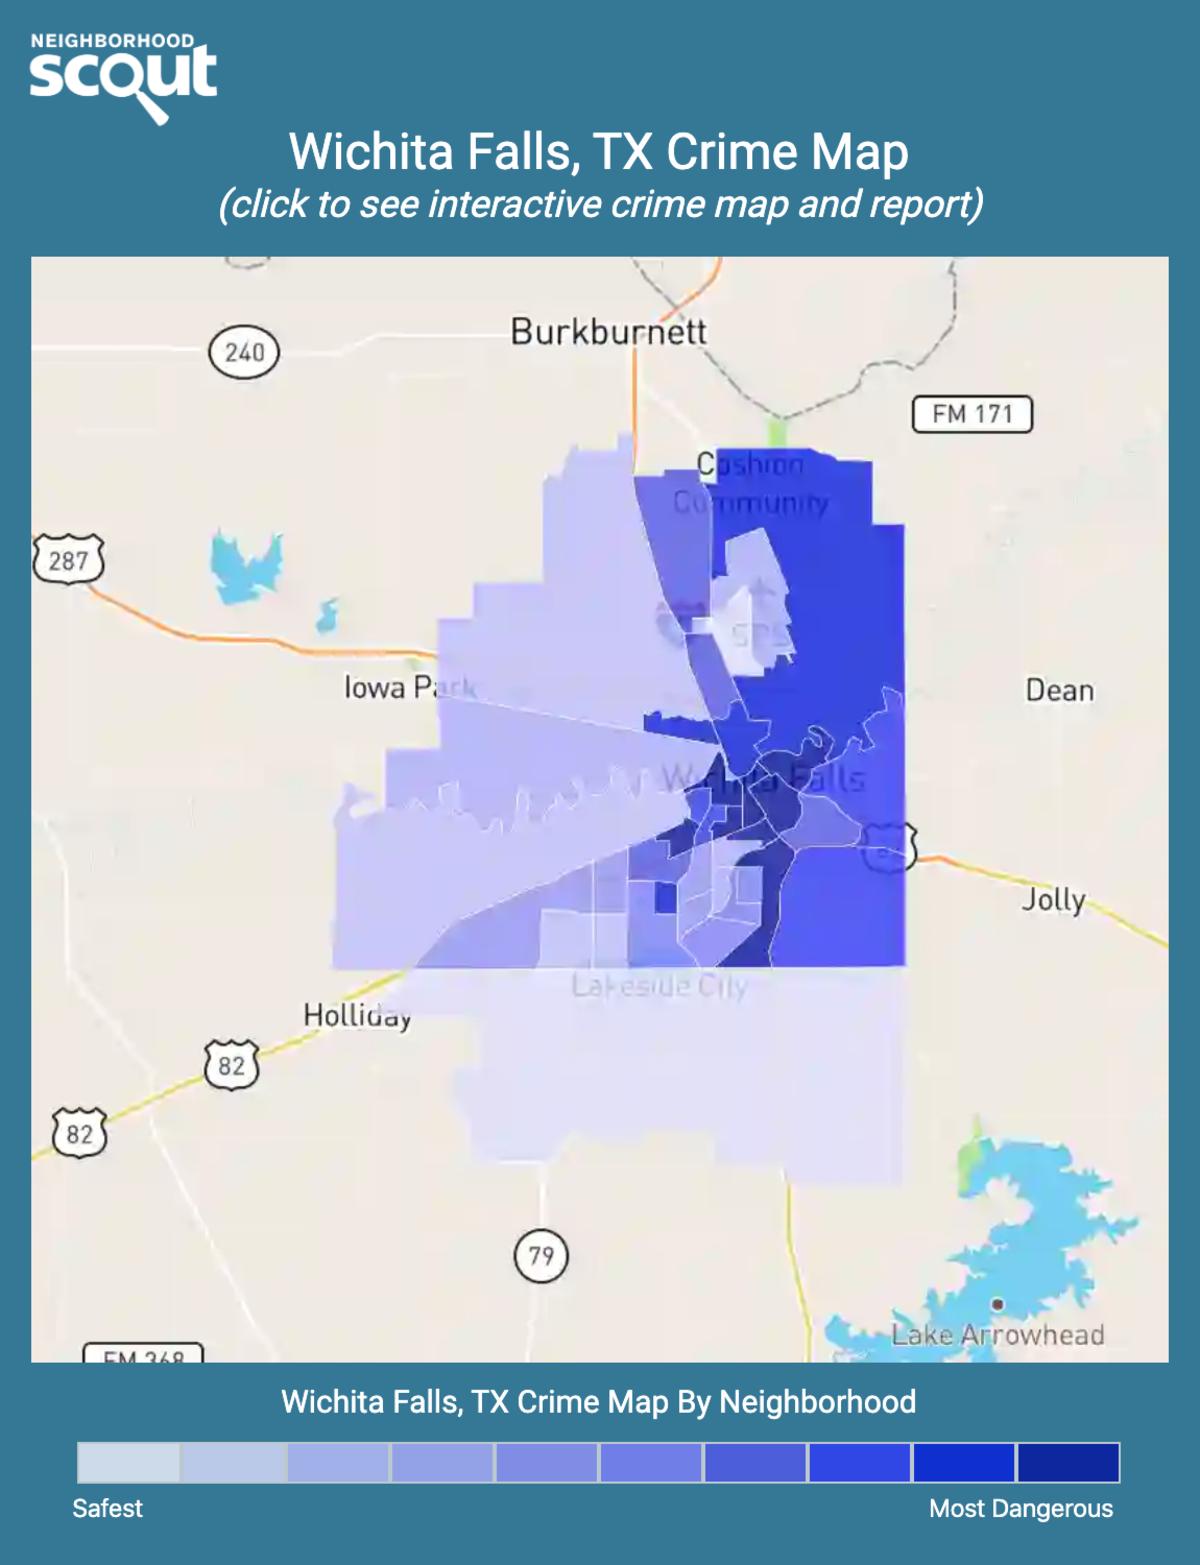 Wichita Falls, Texas crime map